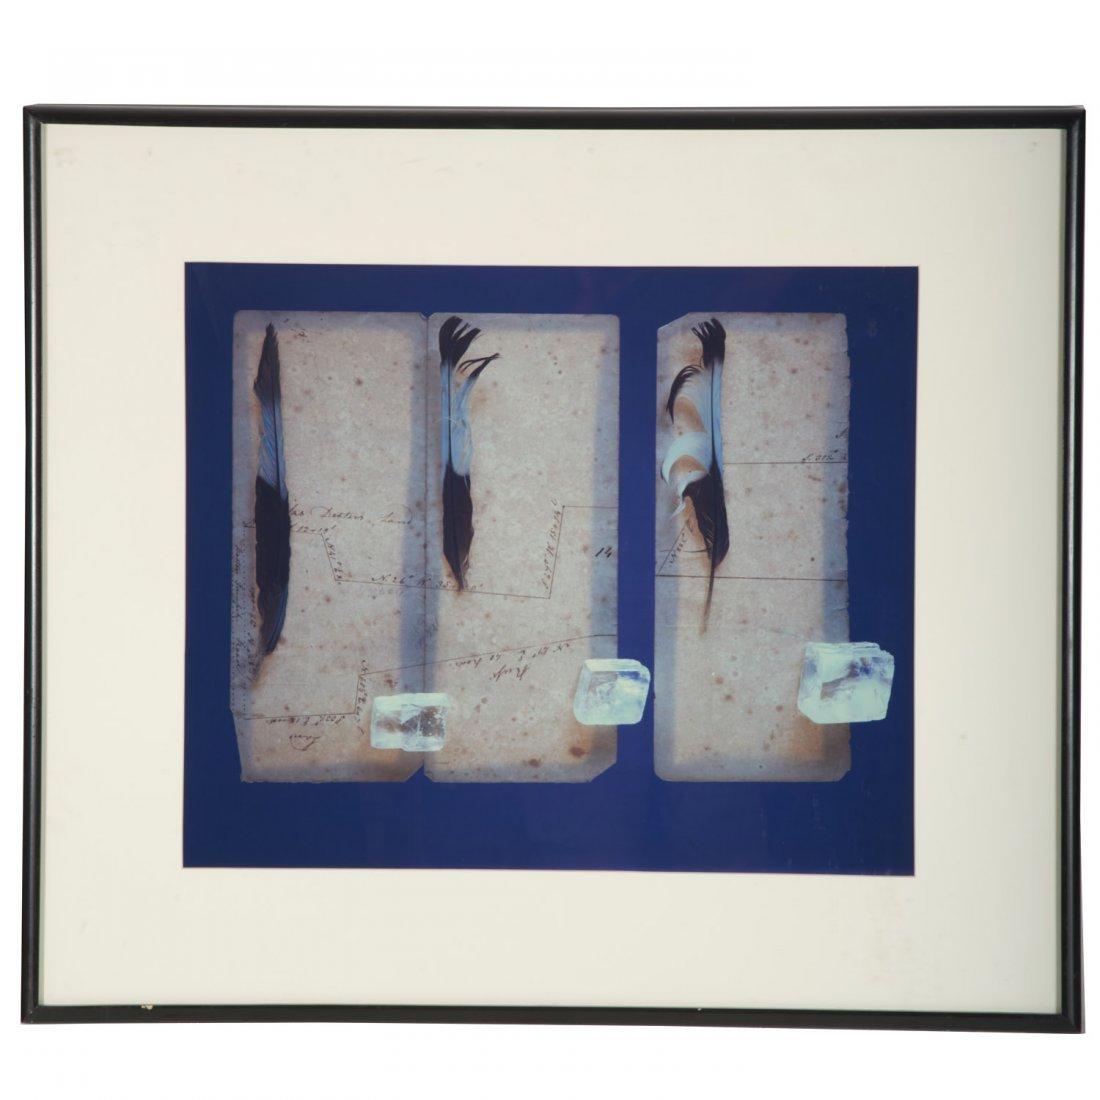 Olivia Parker, photographic print